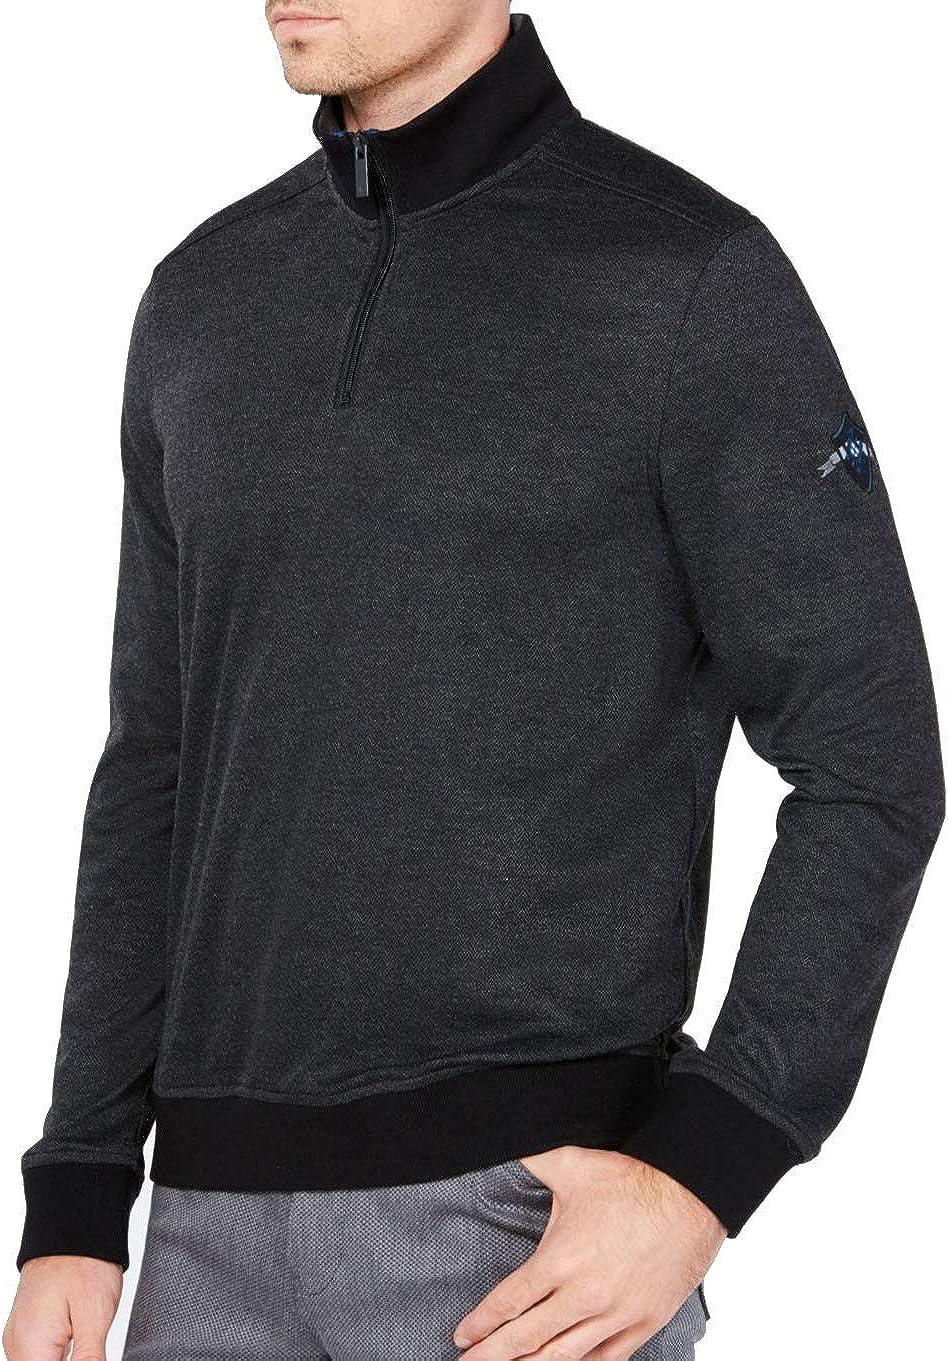 Ryan Seacrest Mens Quarter-Zip Pullover Sweater, Black, XX-Large